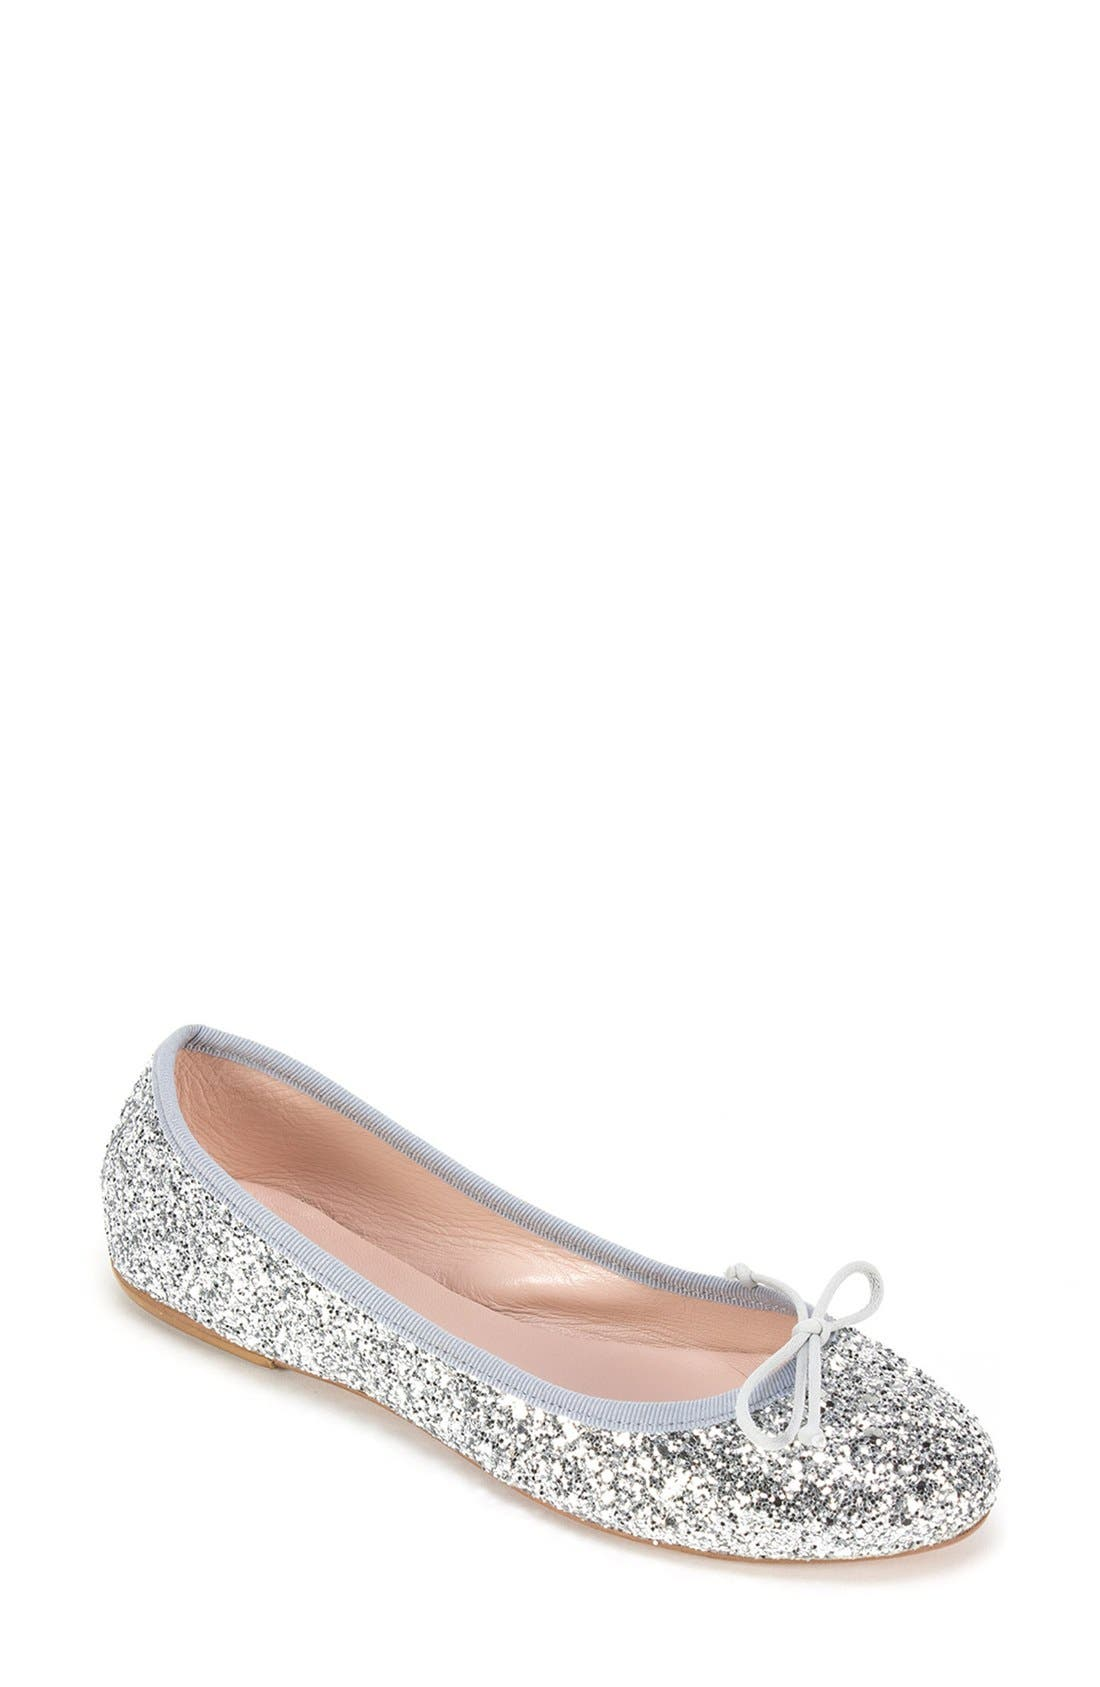 Summit 'Kendall' Ballet Flat,                             Main thumbnail 8, color,